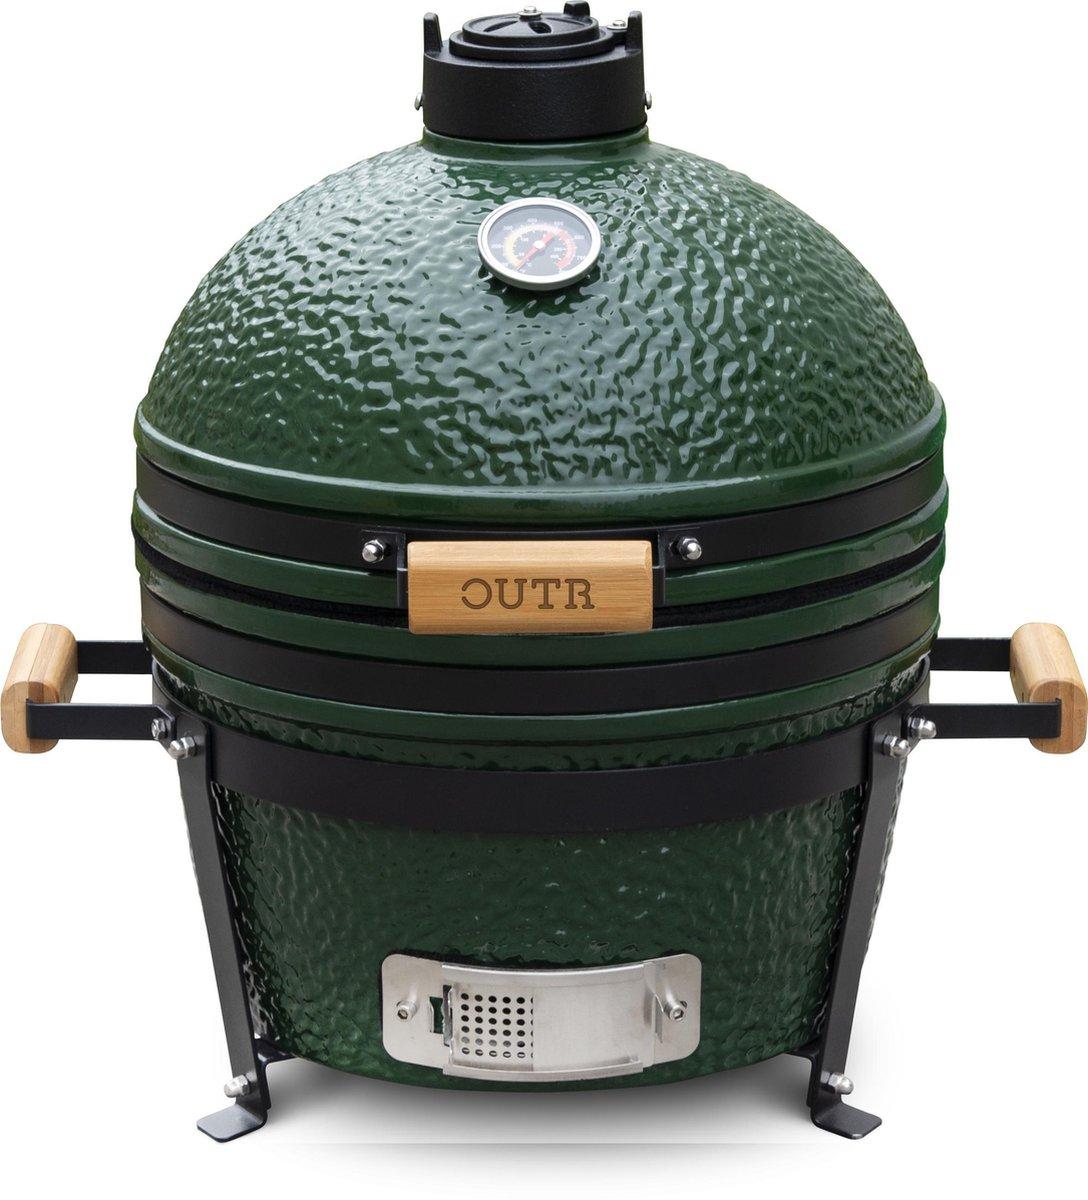 Outr Kamado Grill Medium 40 - Groen